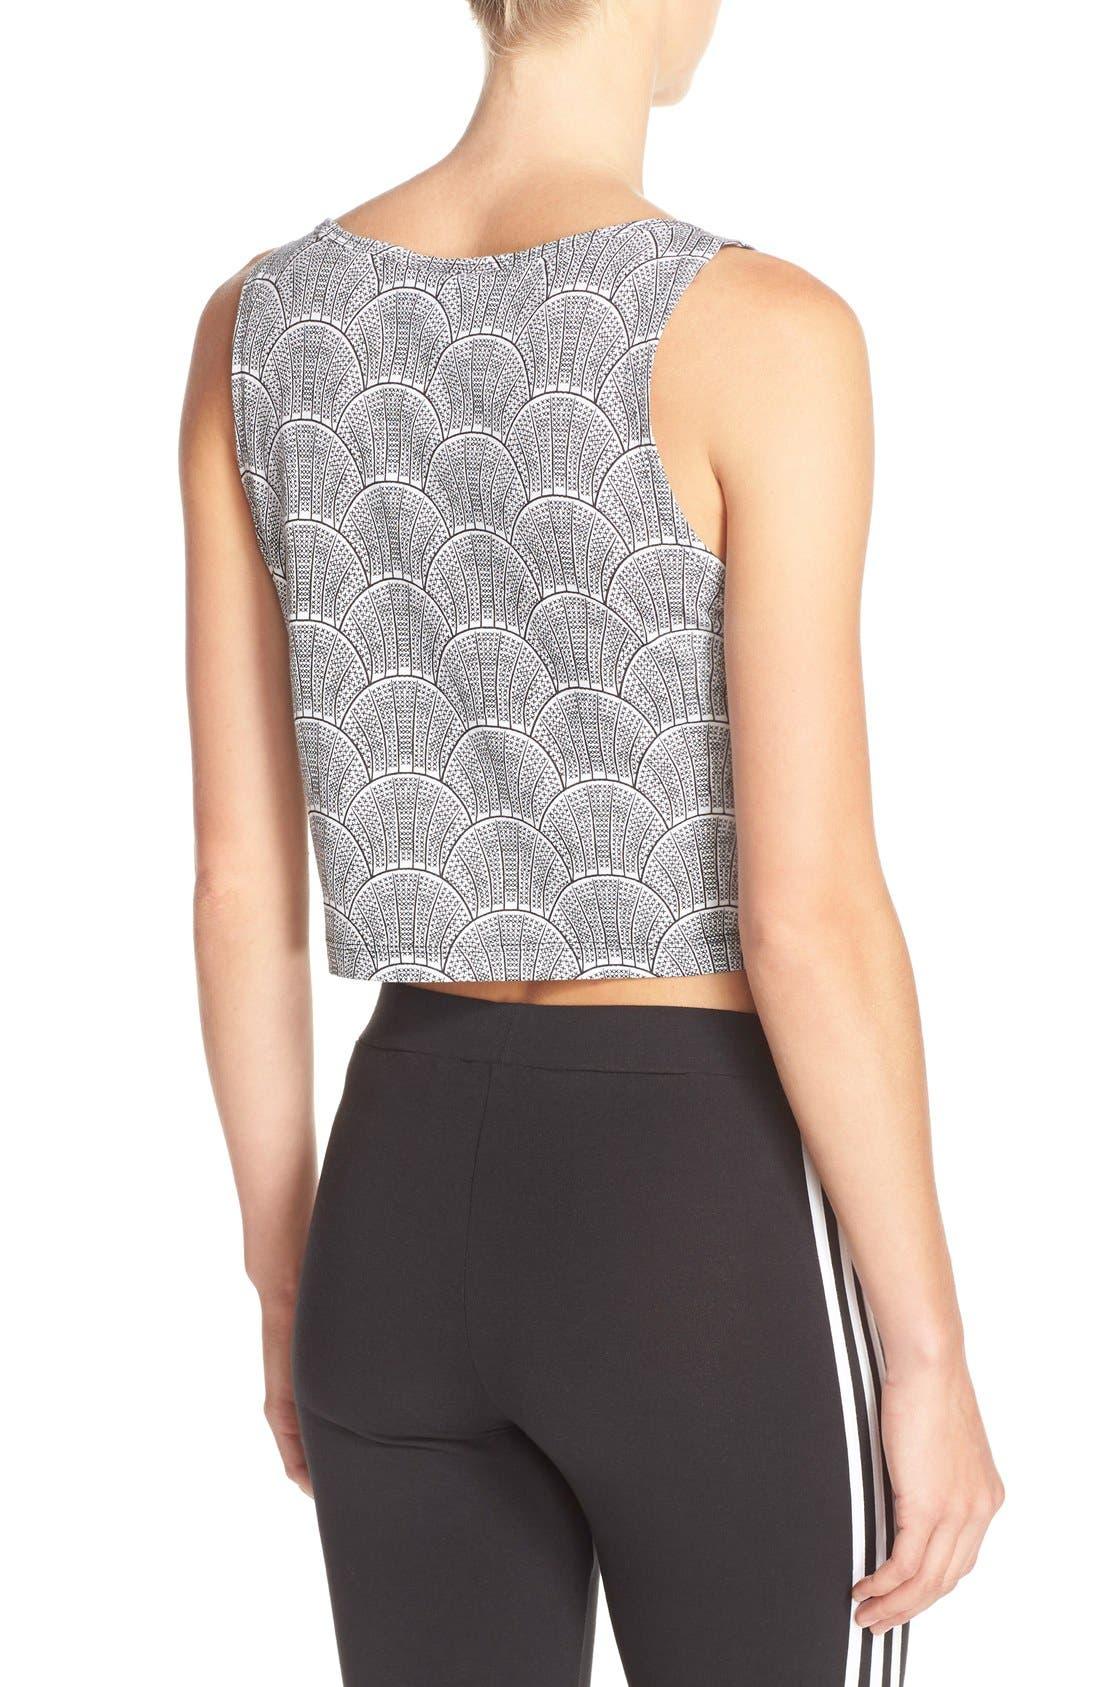 Alternate Image 2  - adidas Originals 'Shell Tile' Crop Tank